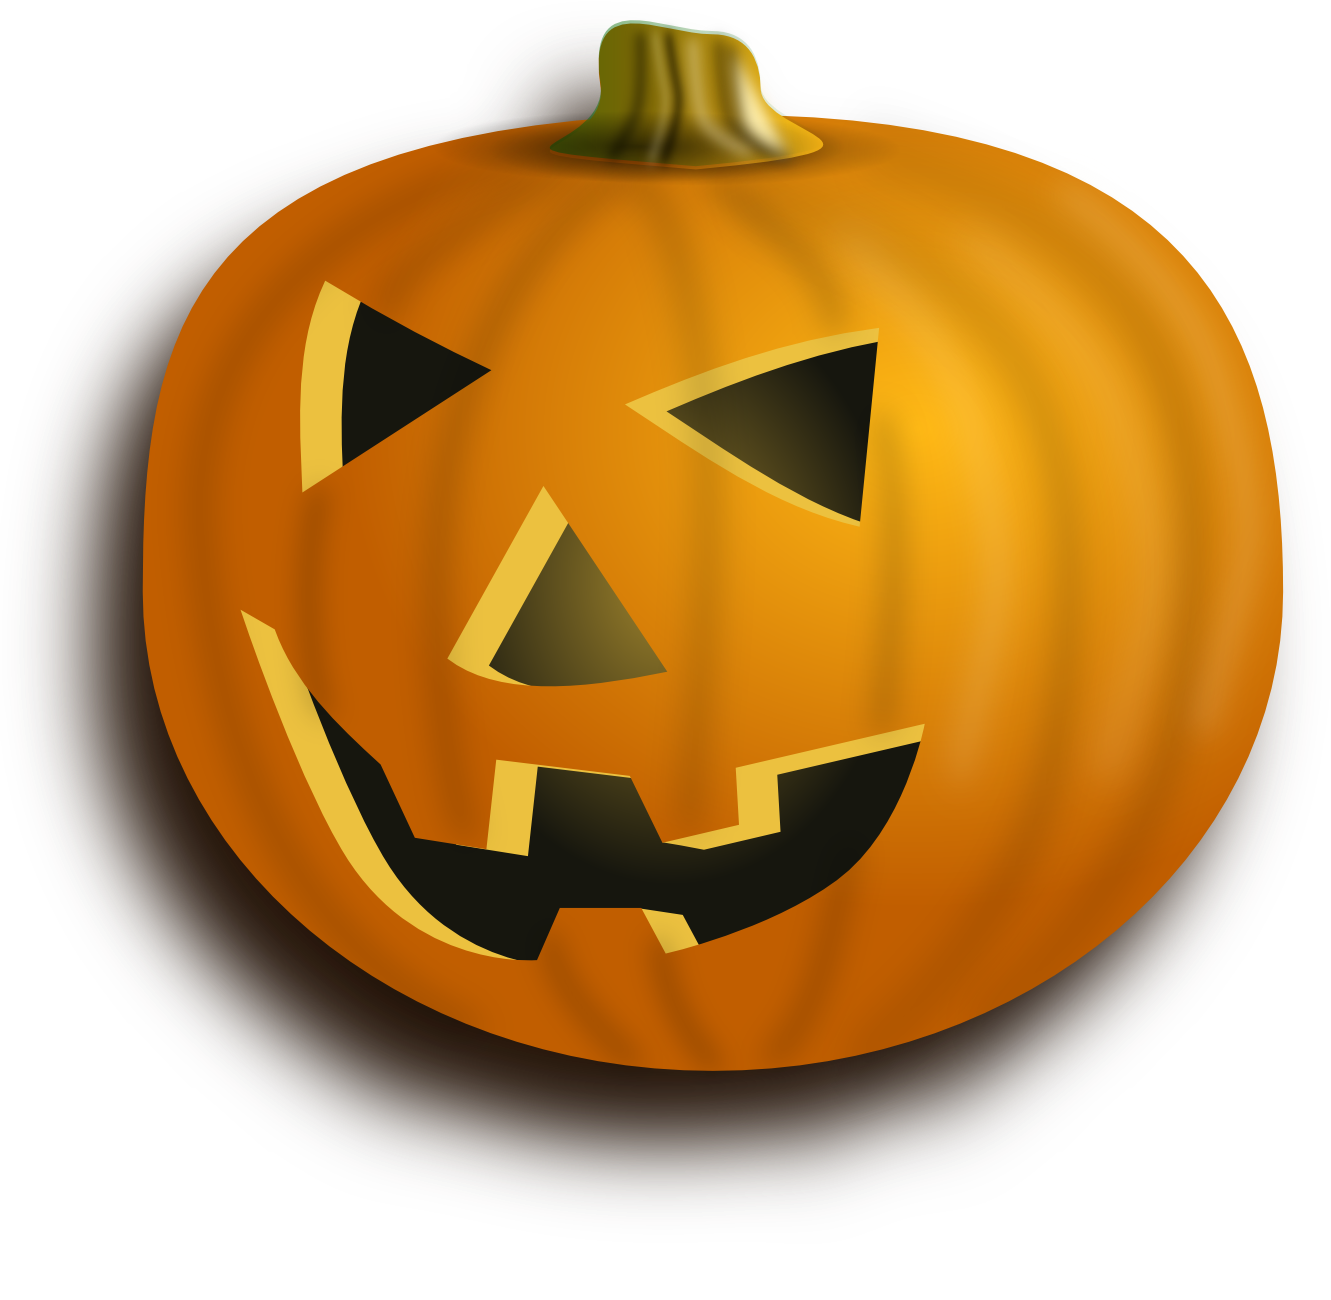 Png images all. Clipart pumpkin transparent background